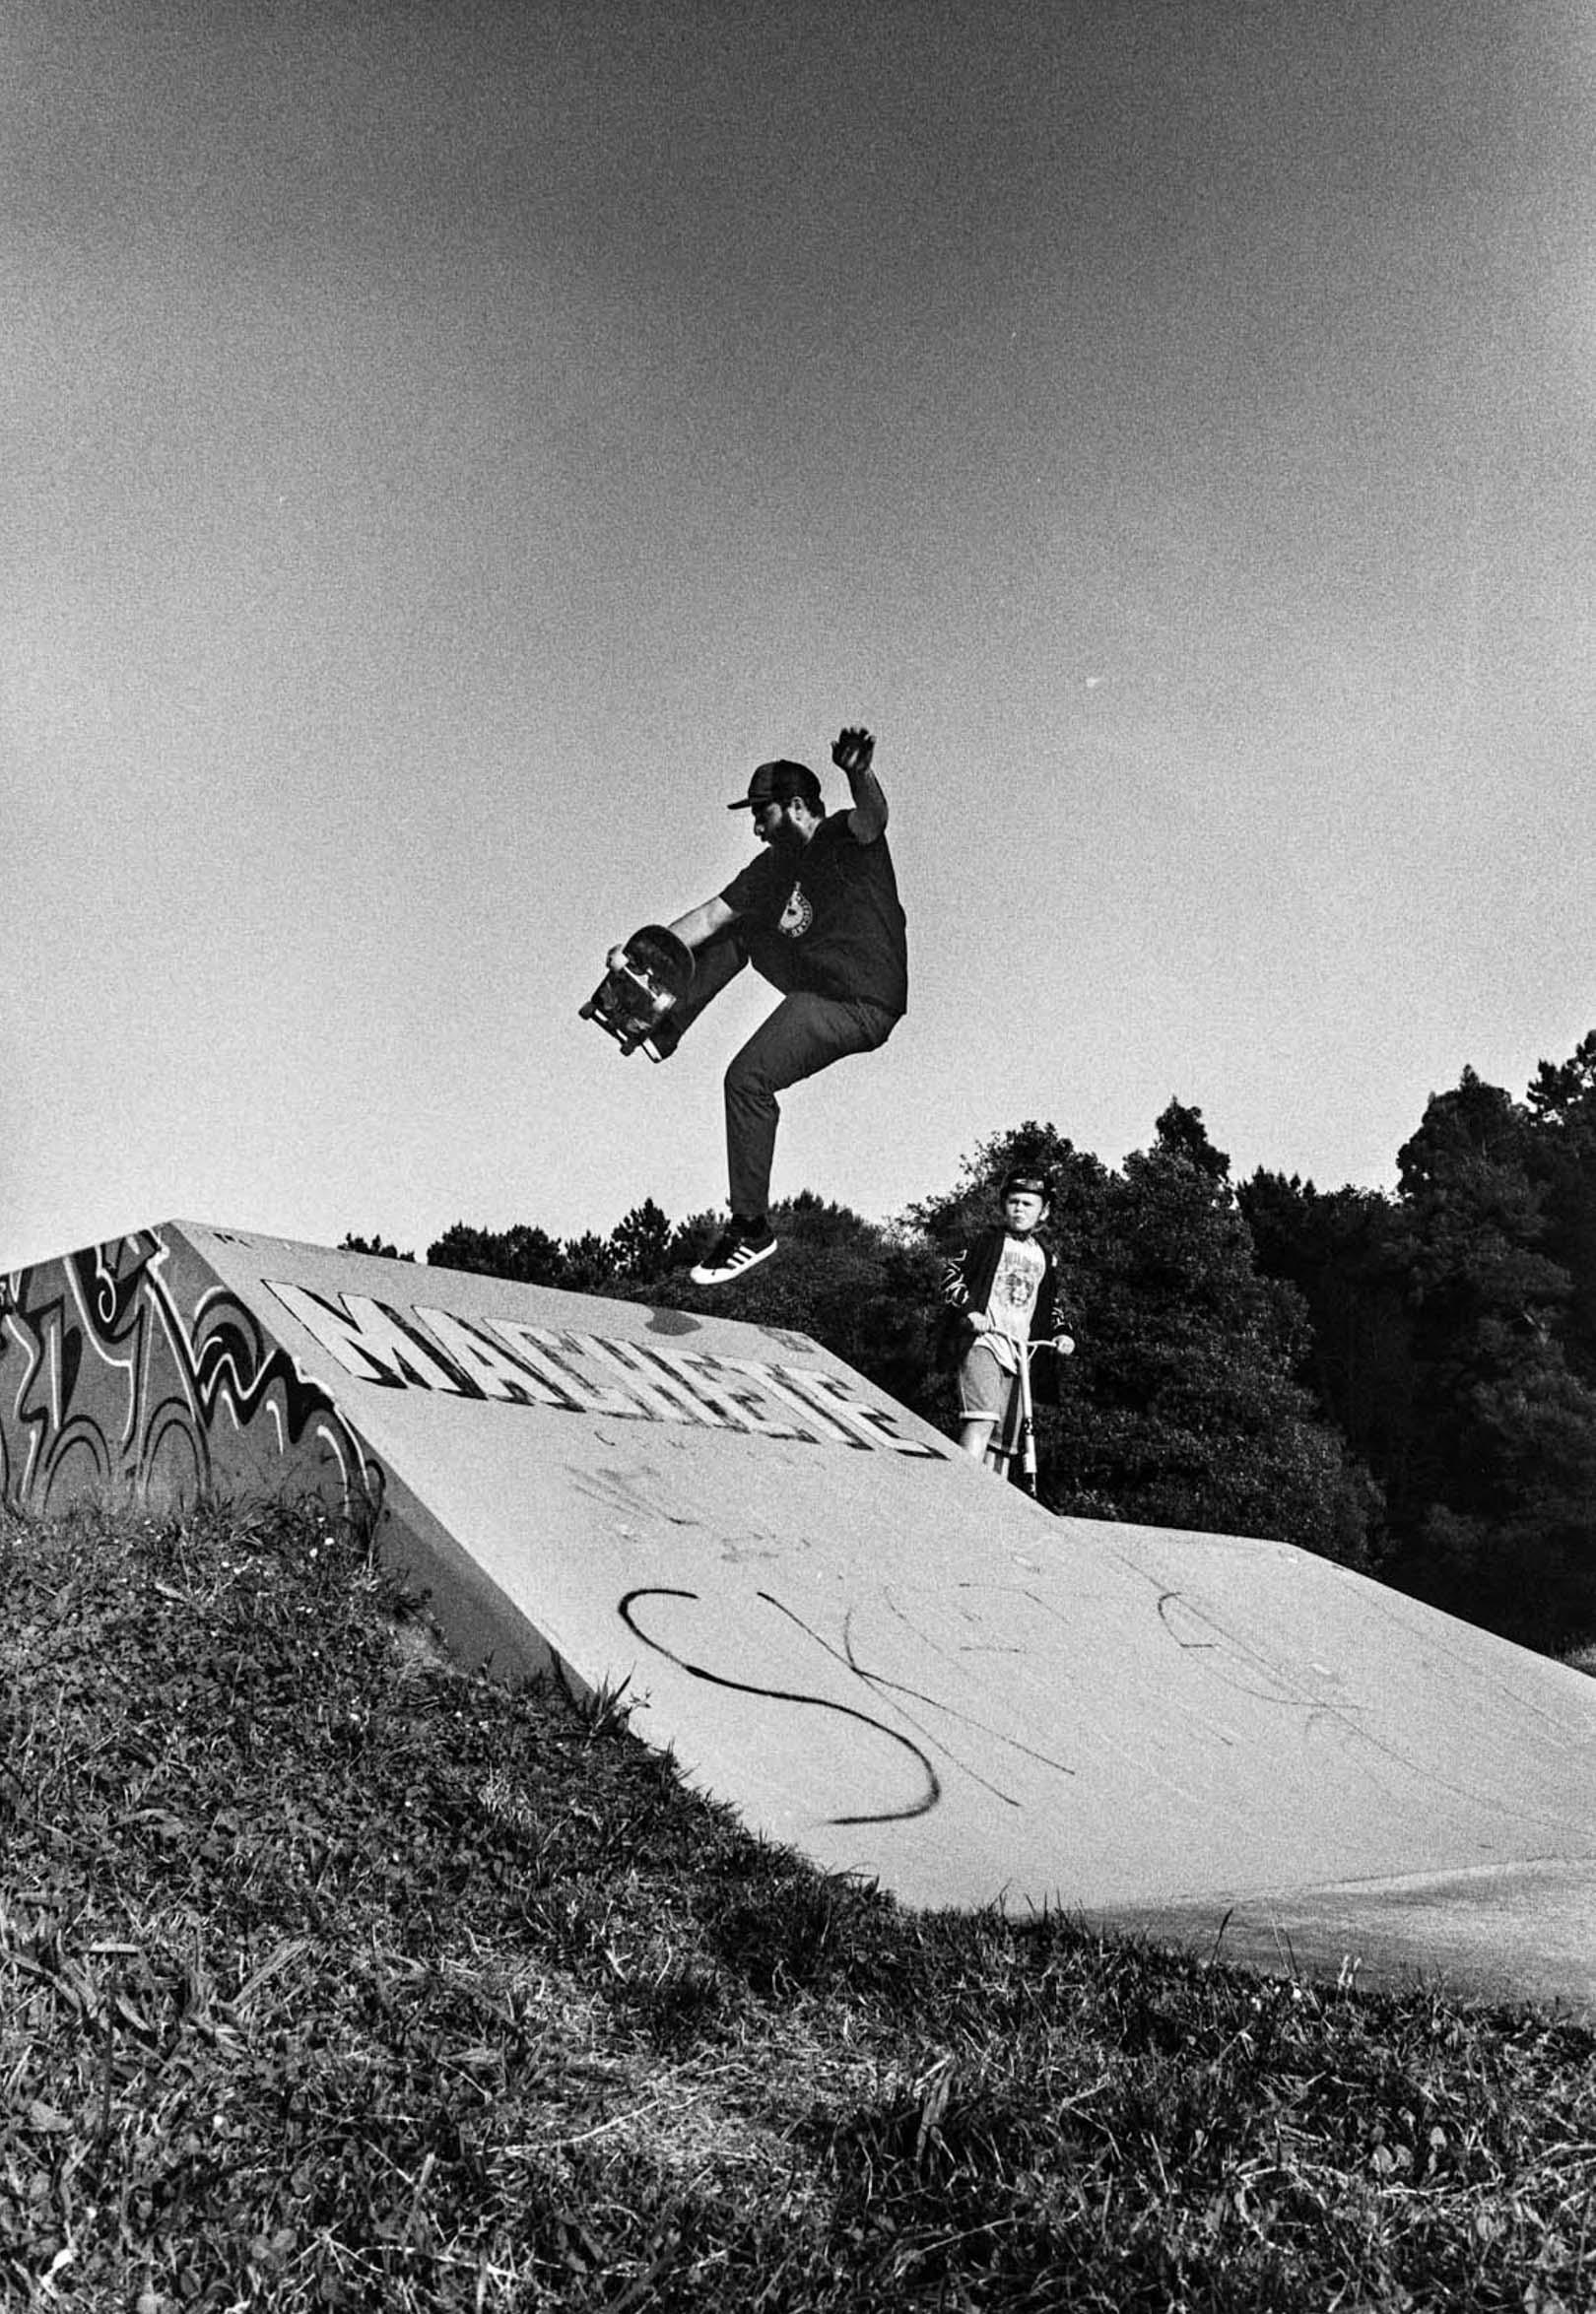 fotografia-coruña-skate-40.jpg